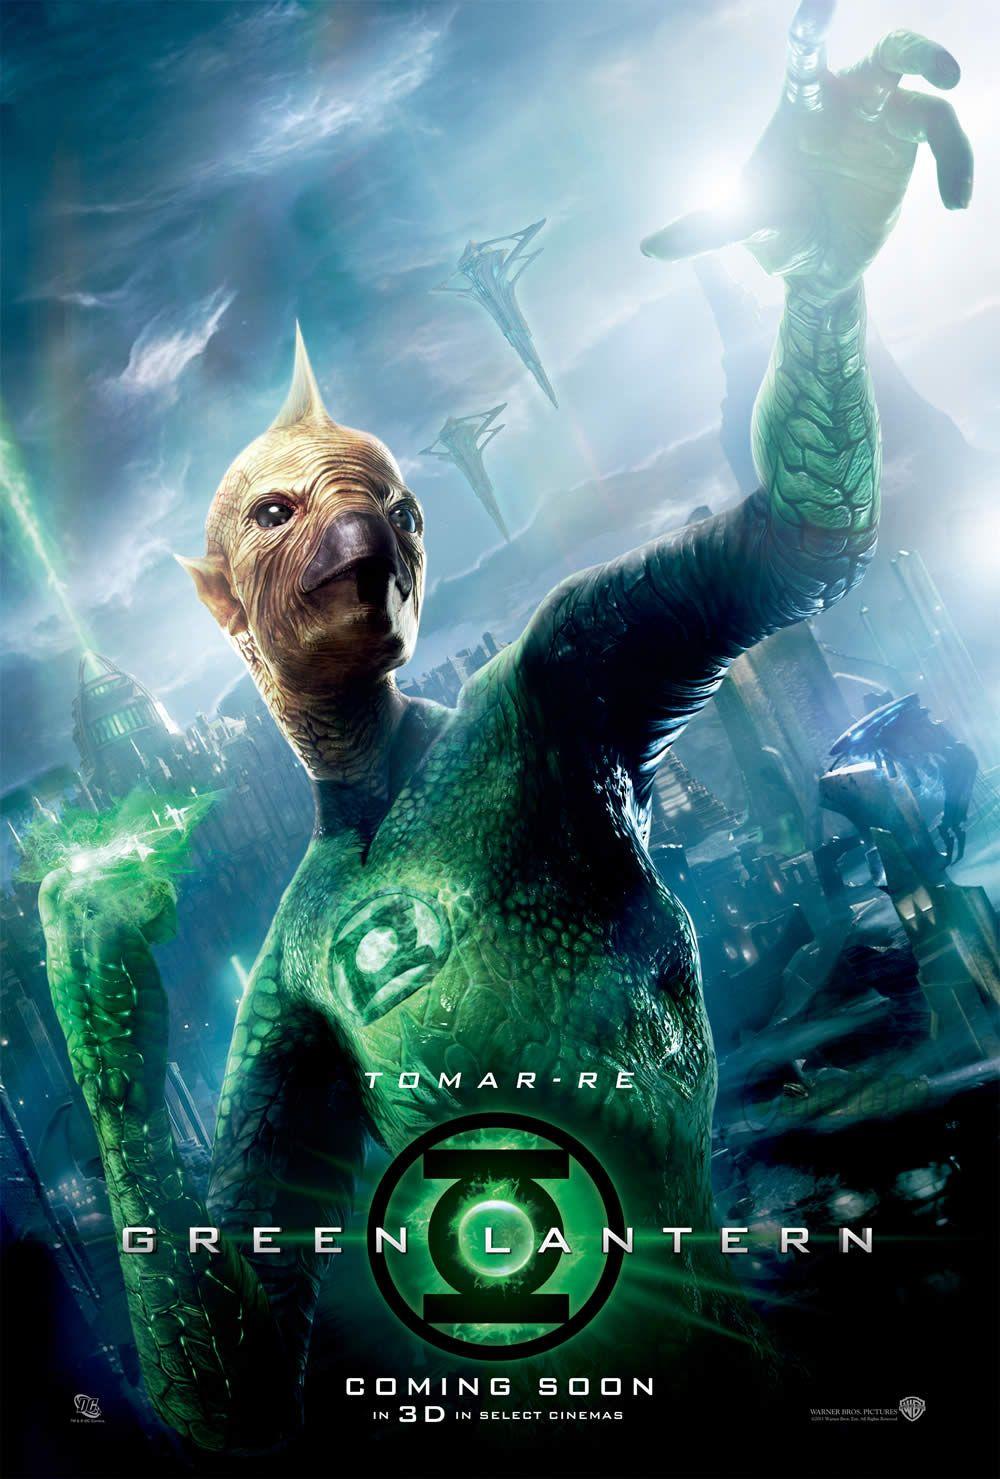 GREEN LANTERN Poster Tomar-Re | Collider Green Lantern Movie Poster